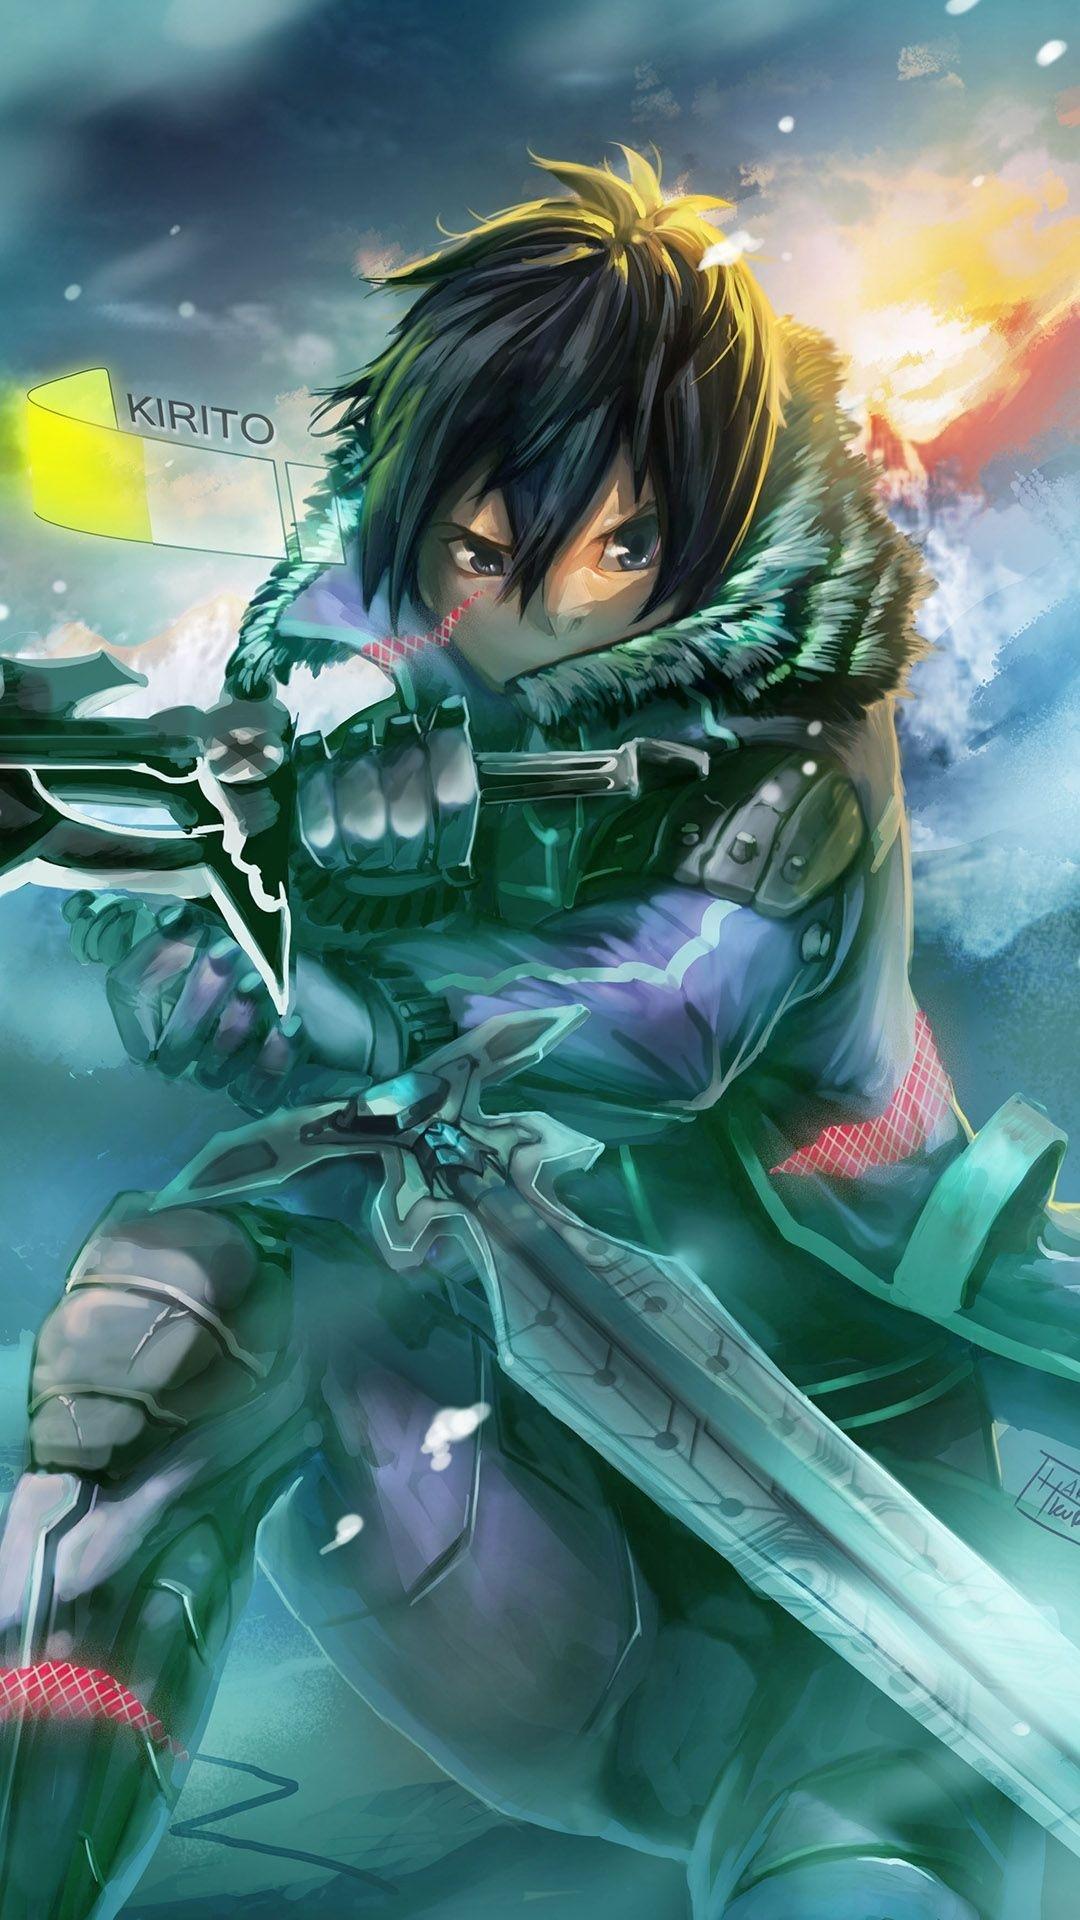 Animesword Art Online 1080x1920 Wallpaper Id 787231